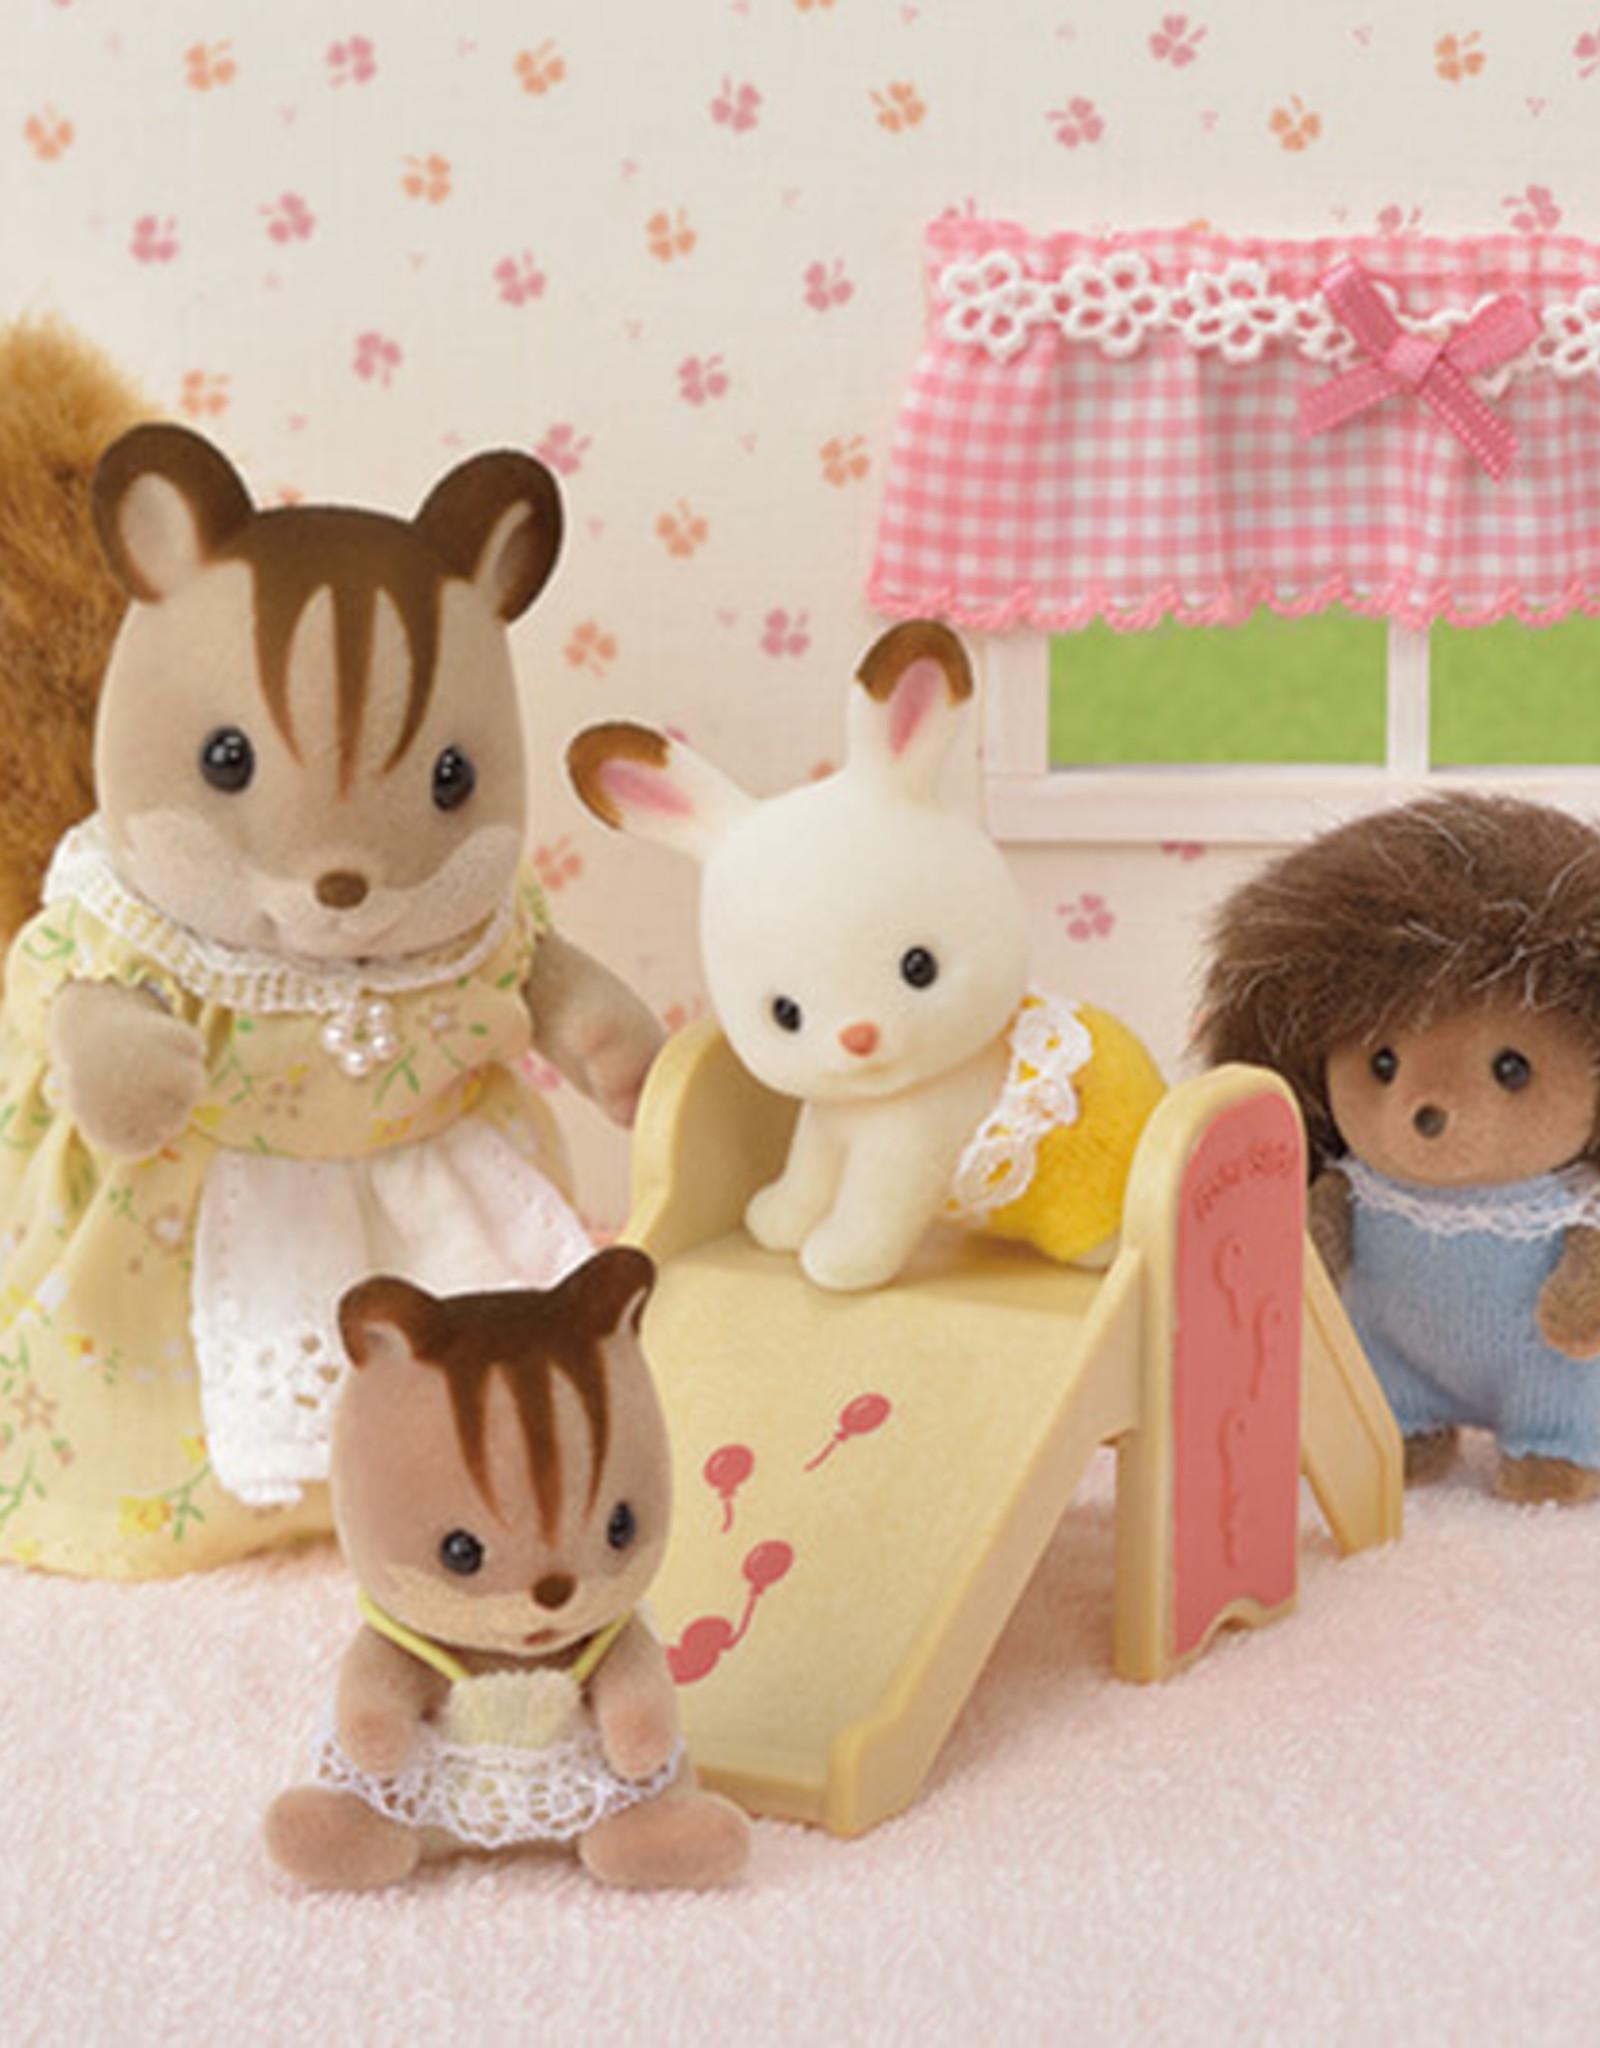 Calico Critters CC Baby Nursery Set